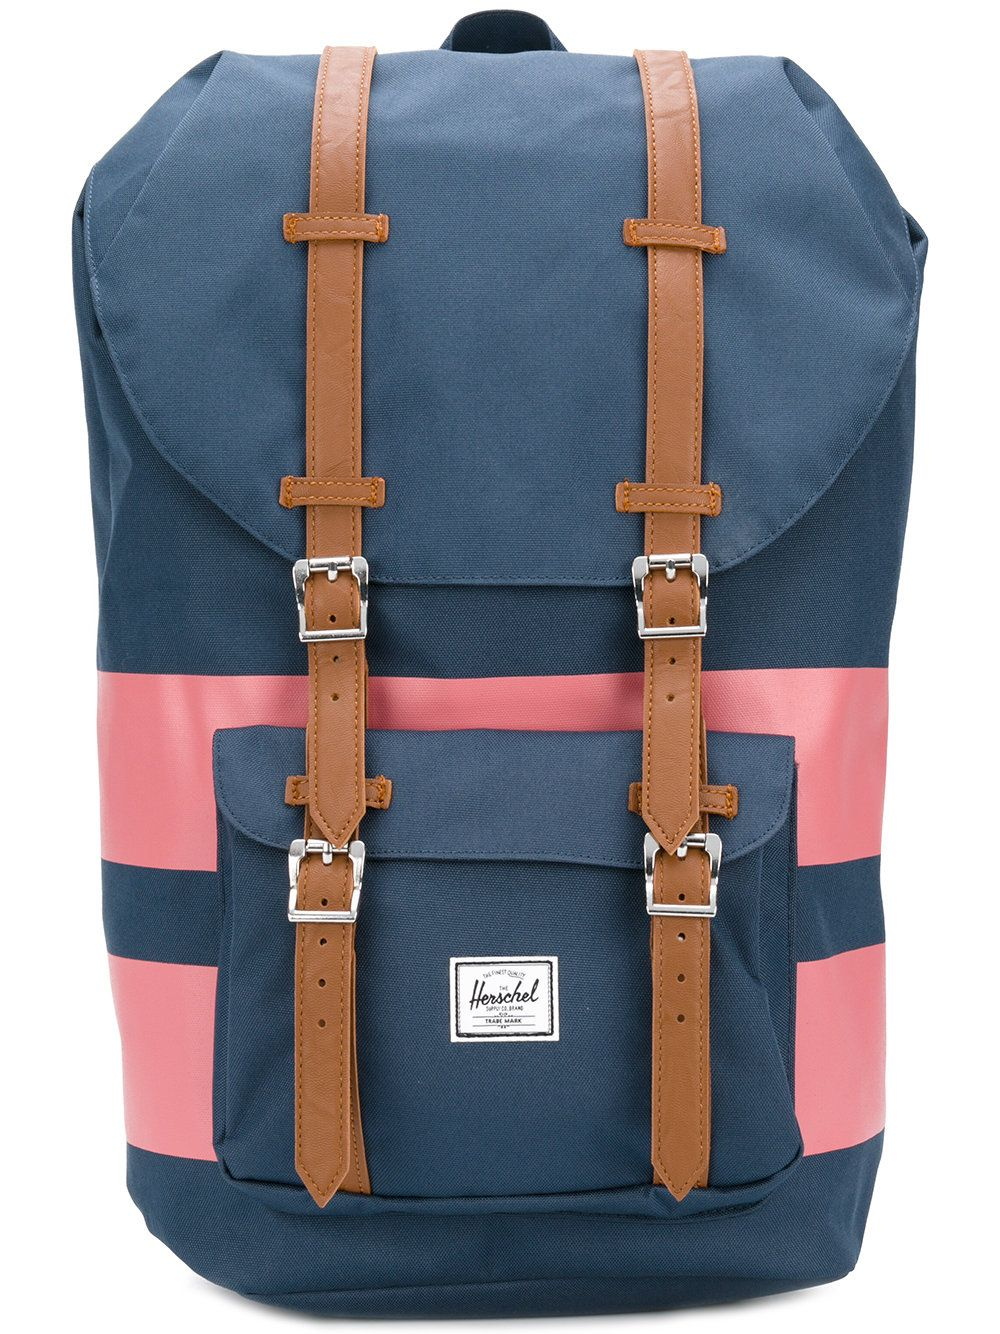 cc3dbcd3b8f7 HERSCHEL SUPPLY CO. BLUE.  herschelsupplyco.  bags  backpacks   Shop